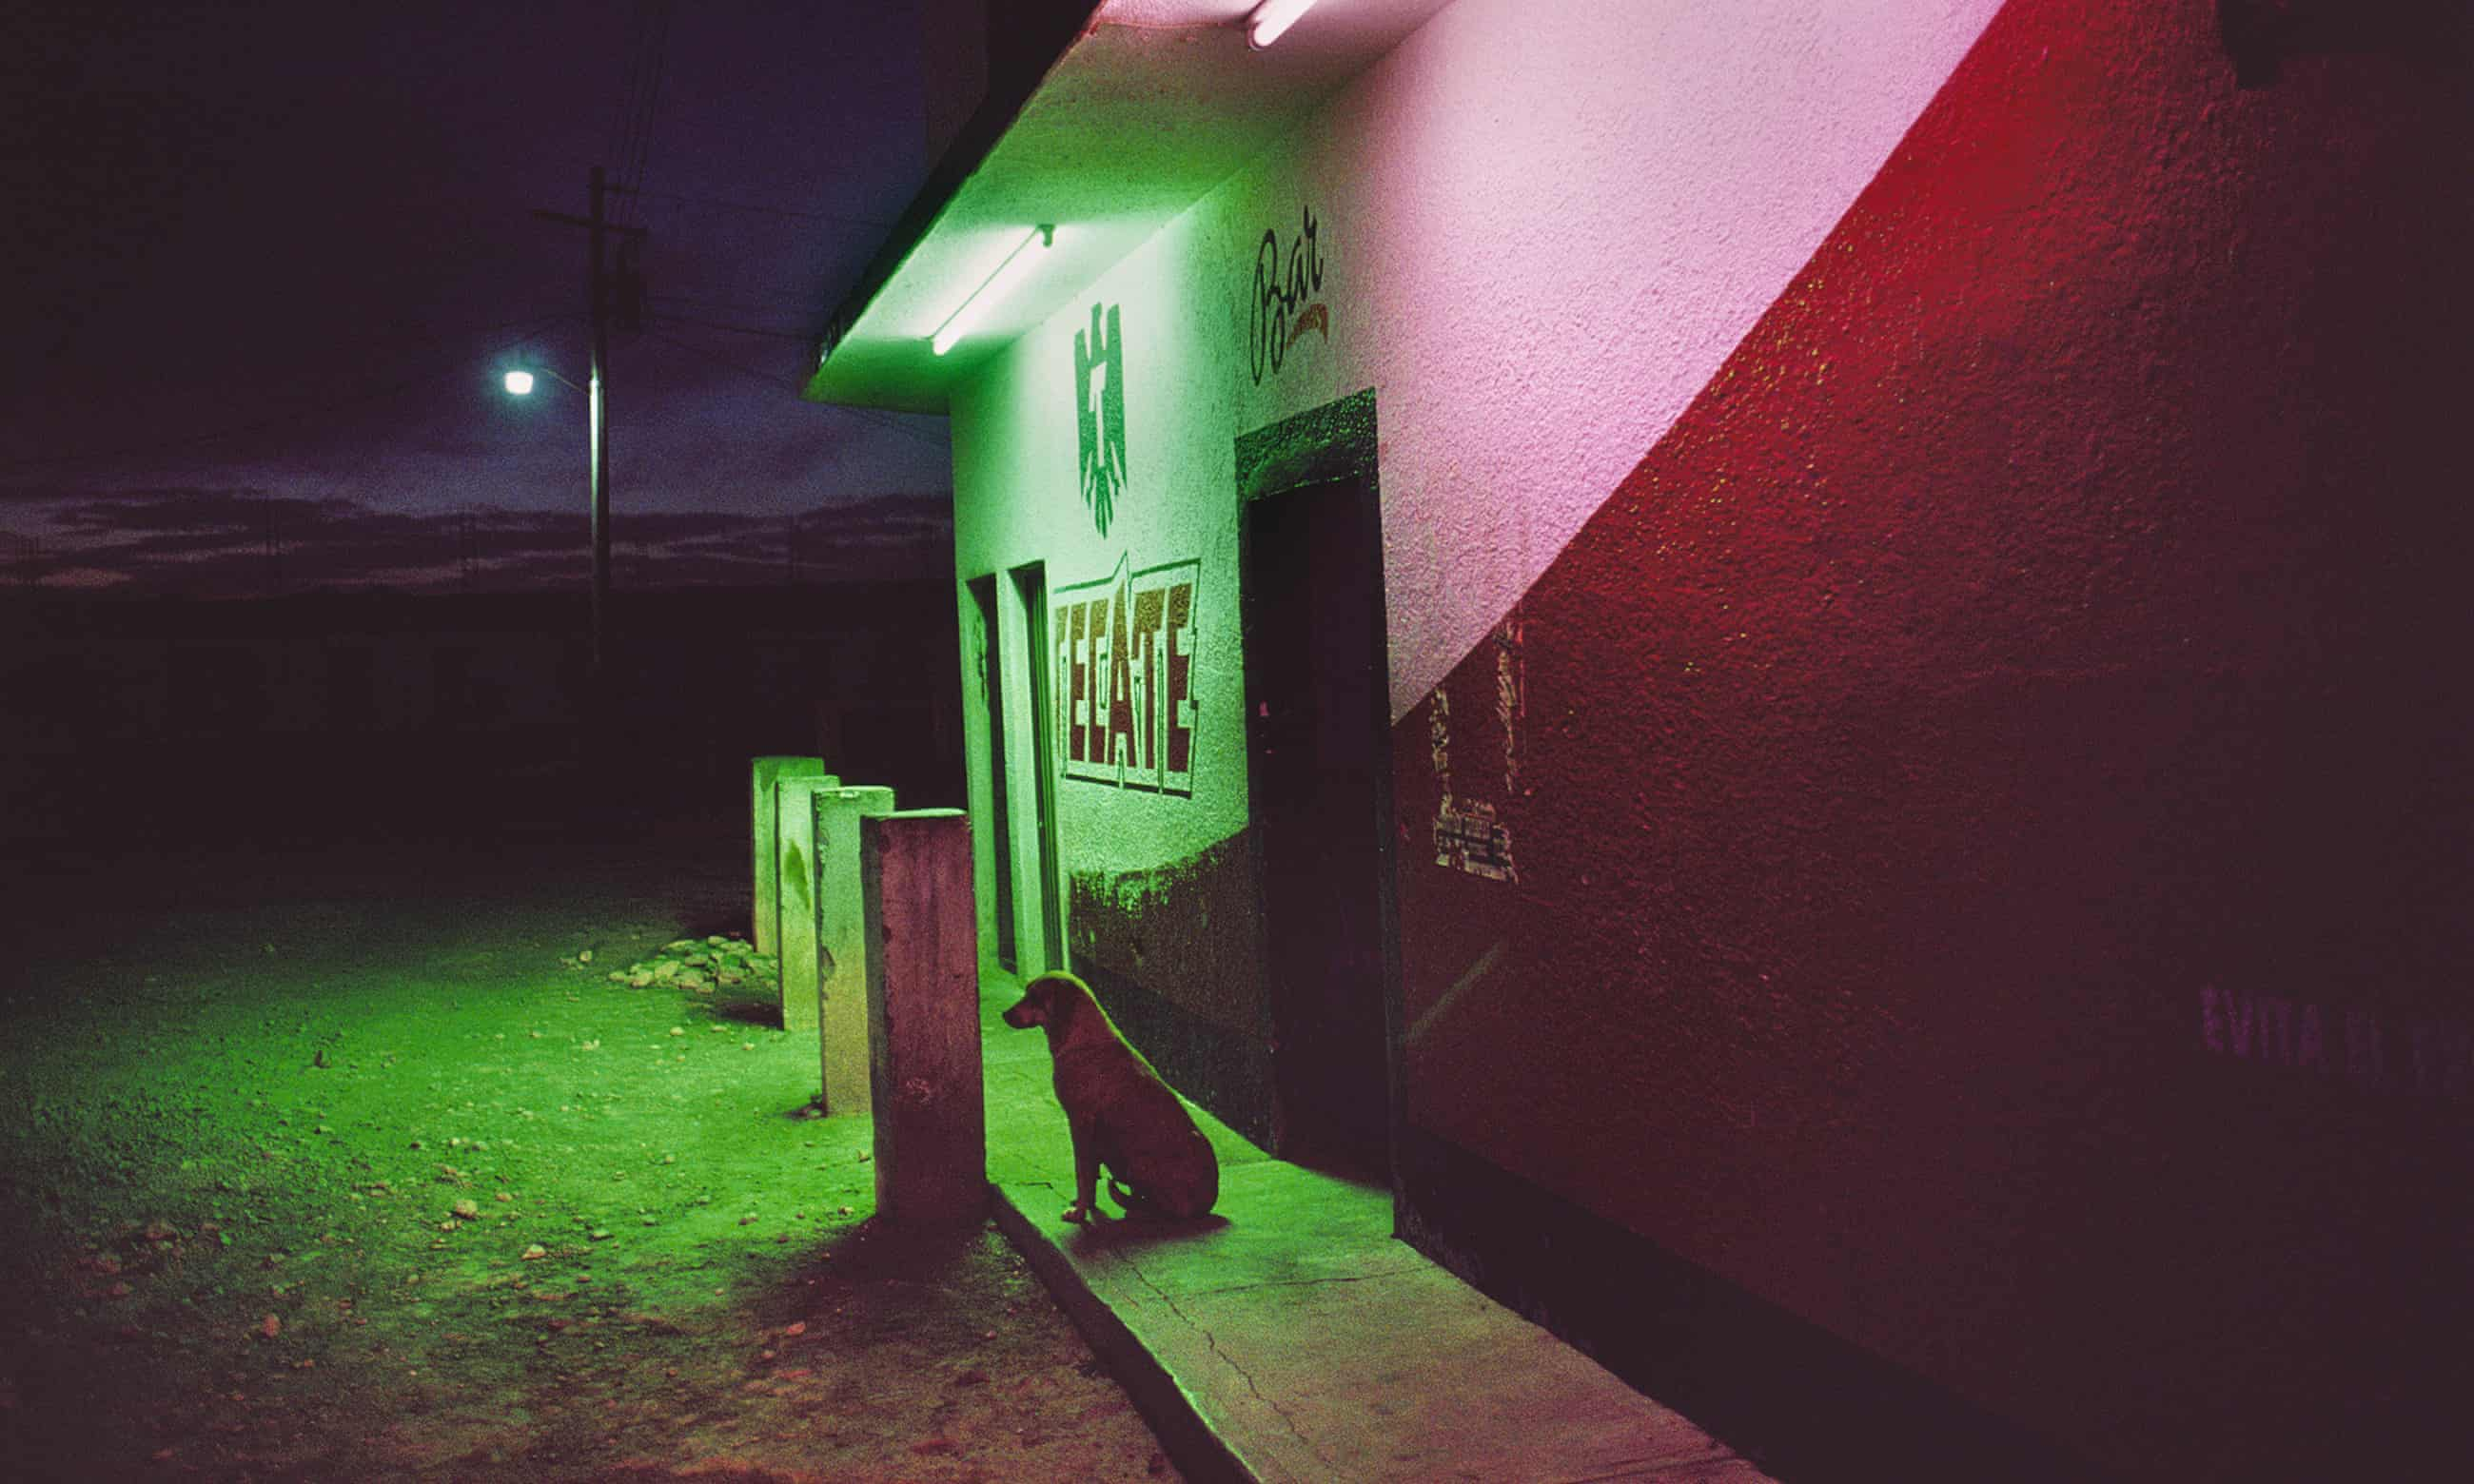 La Calle: Magnum photographer Alex Webb's images of Mexico – in pictures